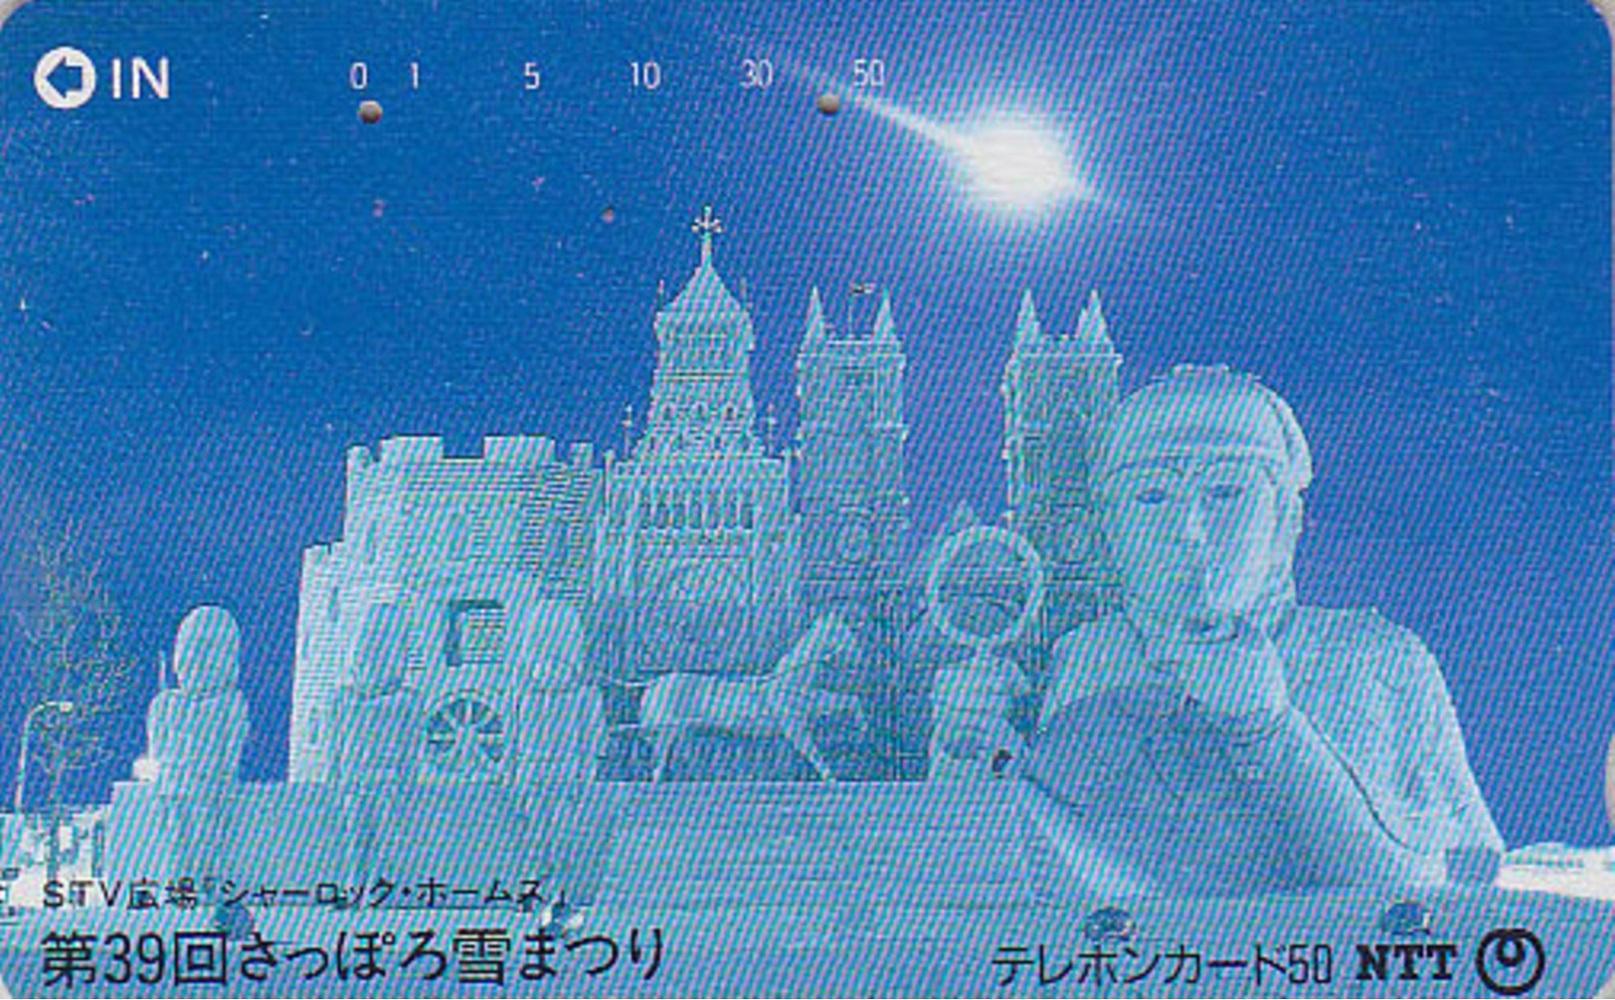 Five Japanese Sherlockian Themed Phone Cards